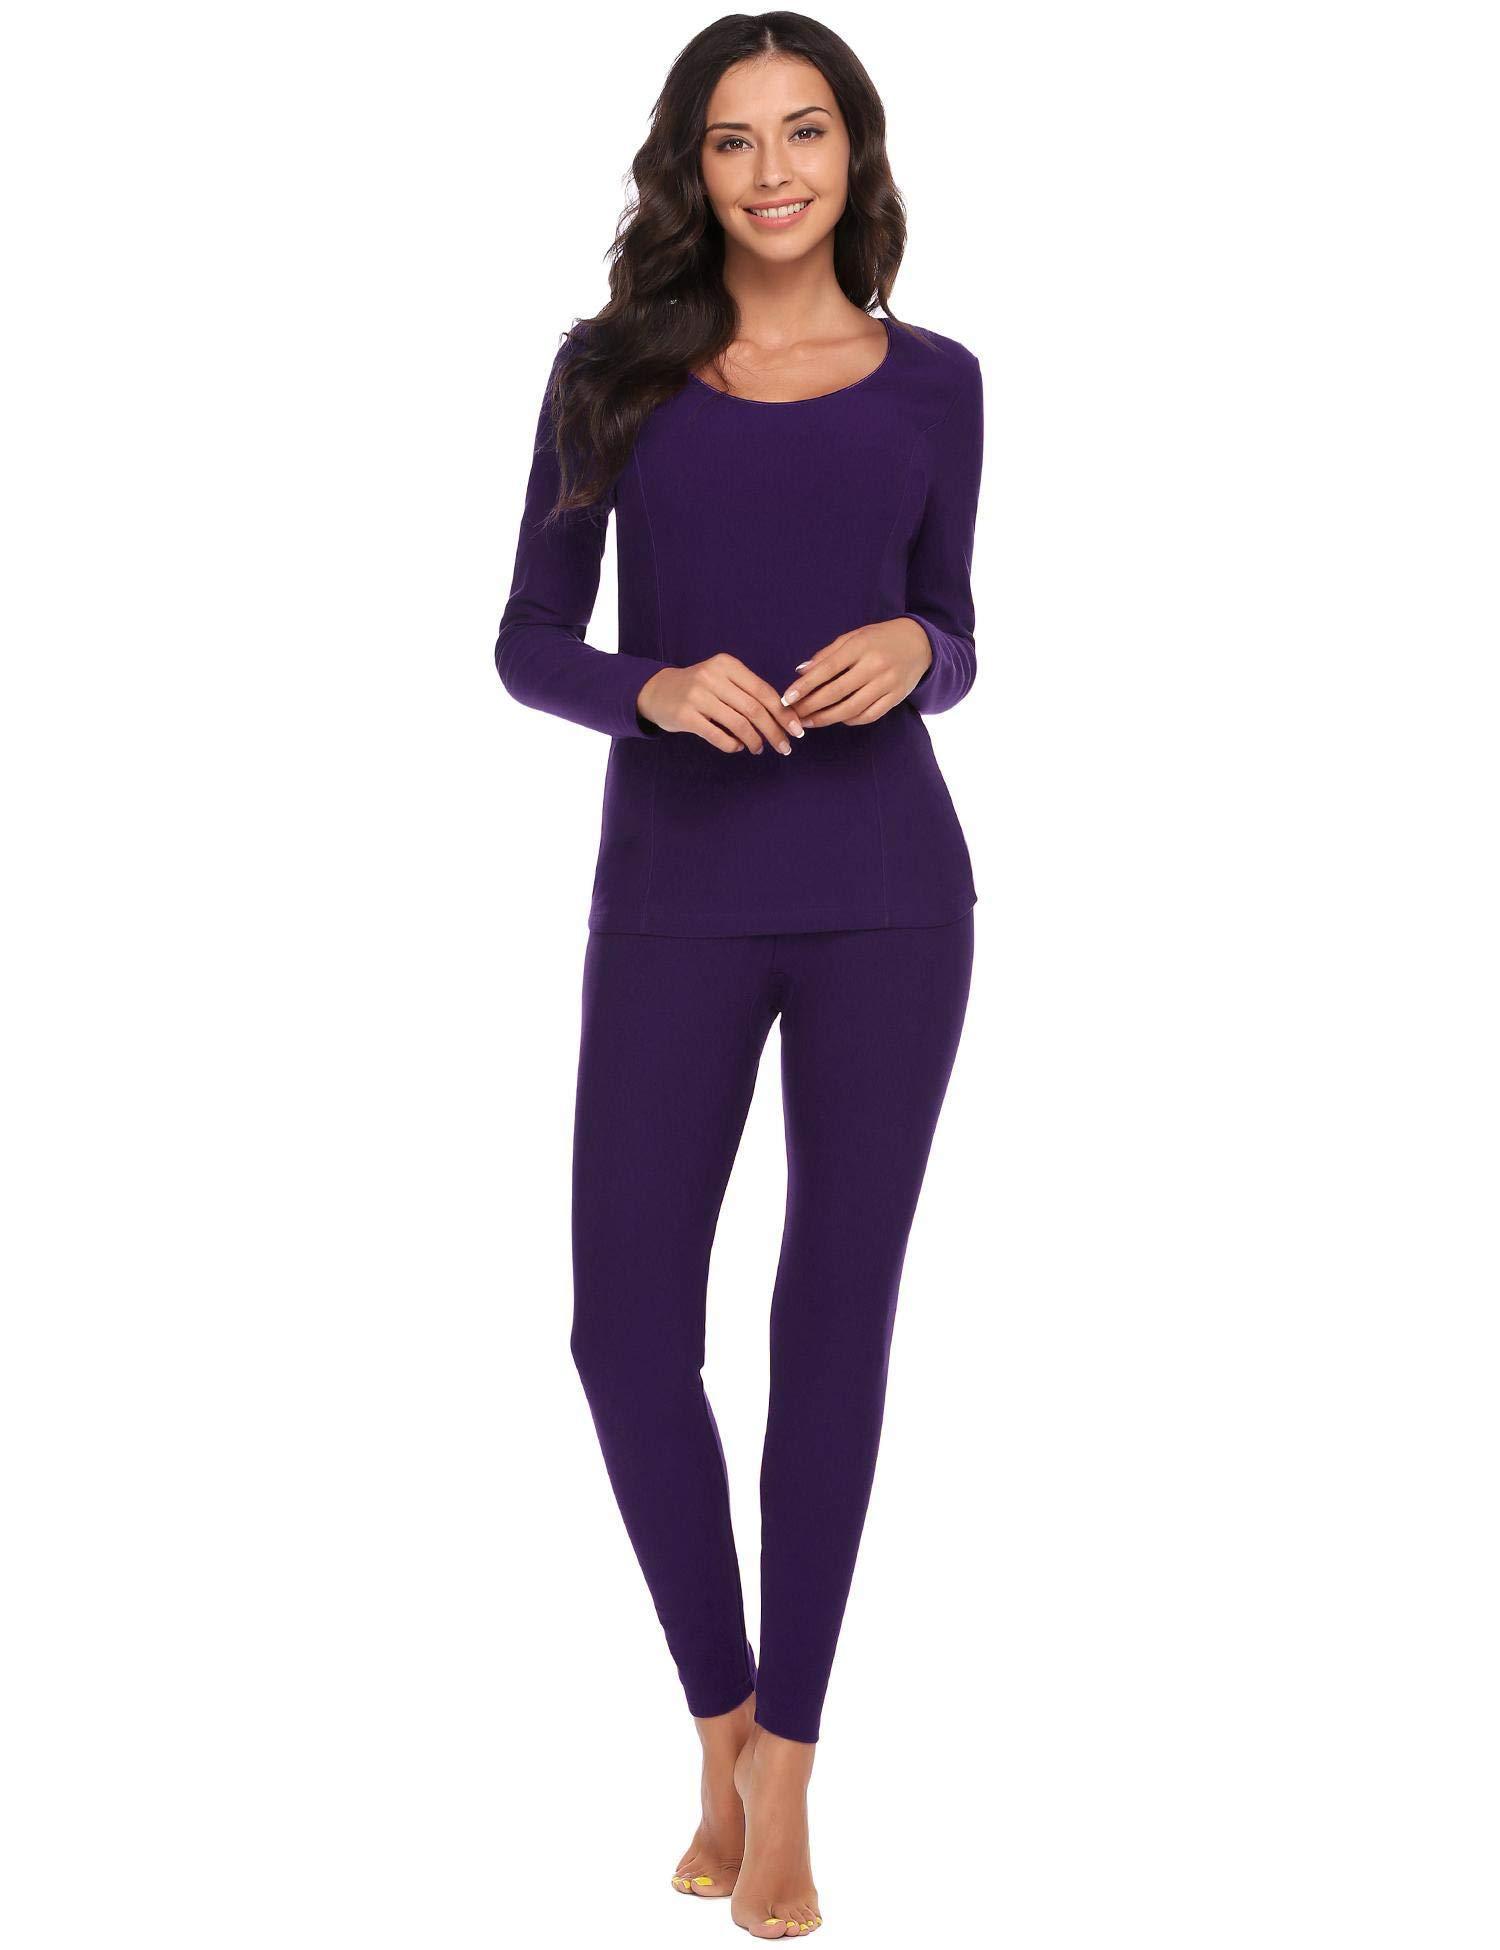 Goldenfox Women 2 Piece Winter Nightgowns Warm Long Thermal Set Plus Size (Purple, XXXL)